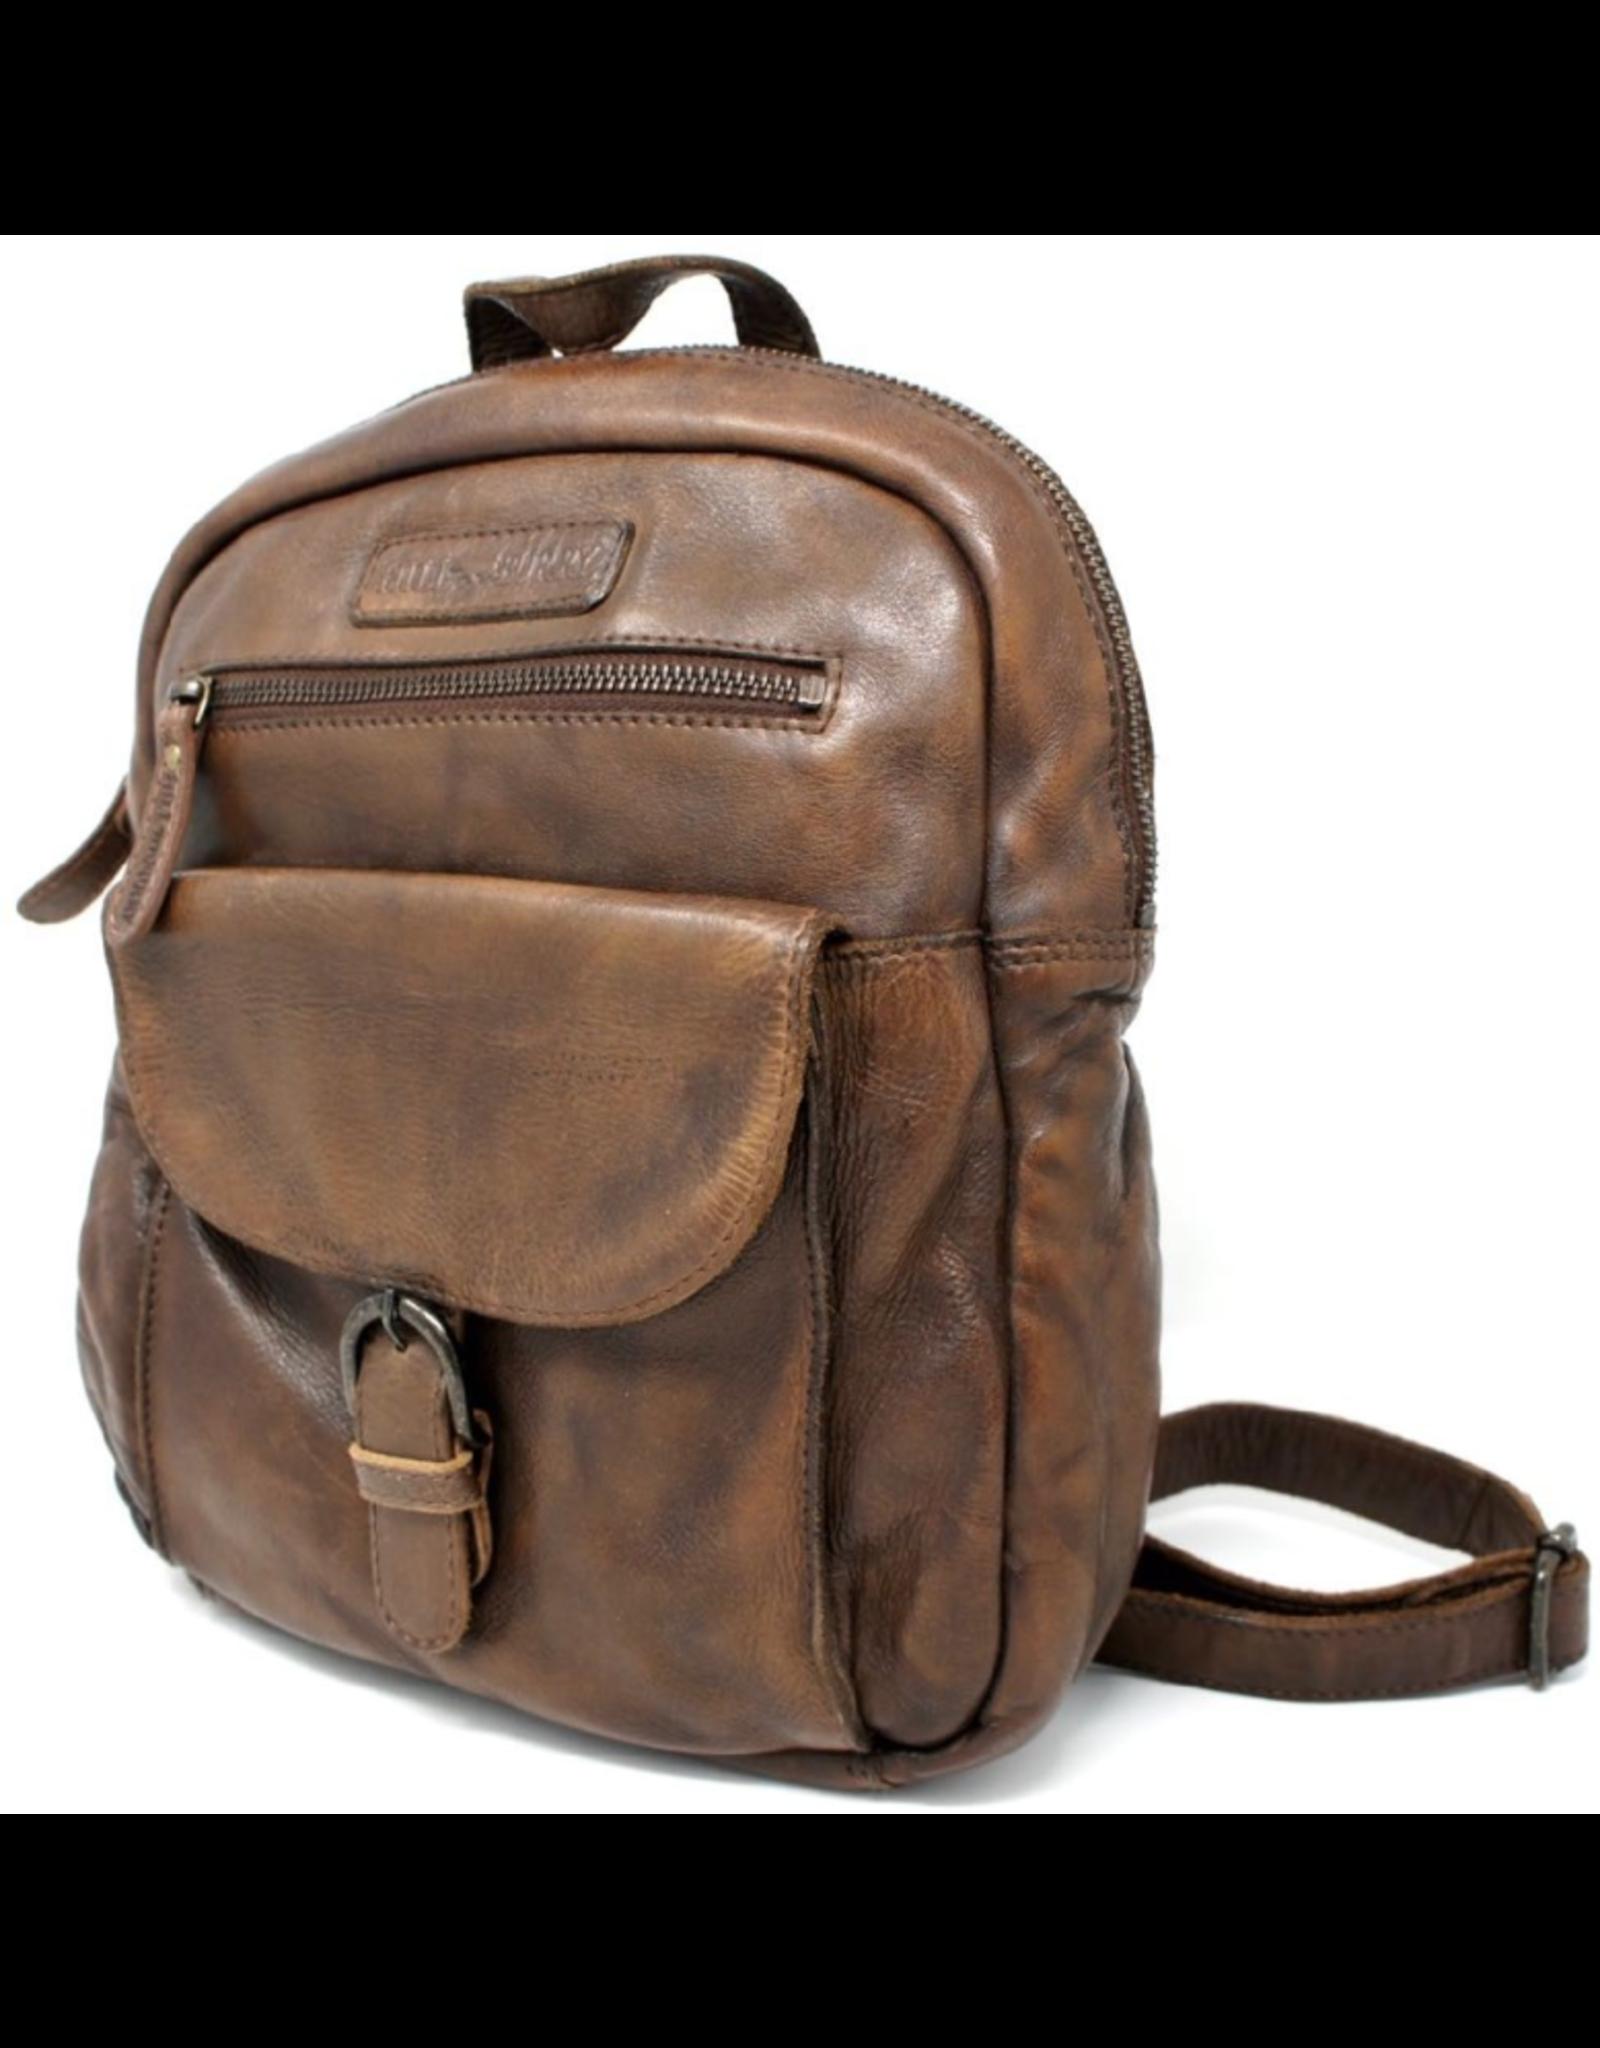 HillBurry Leren rugzakken en leren shoppers - HillBurry Rugzak Gewassen leer bruin